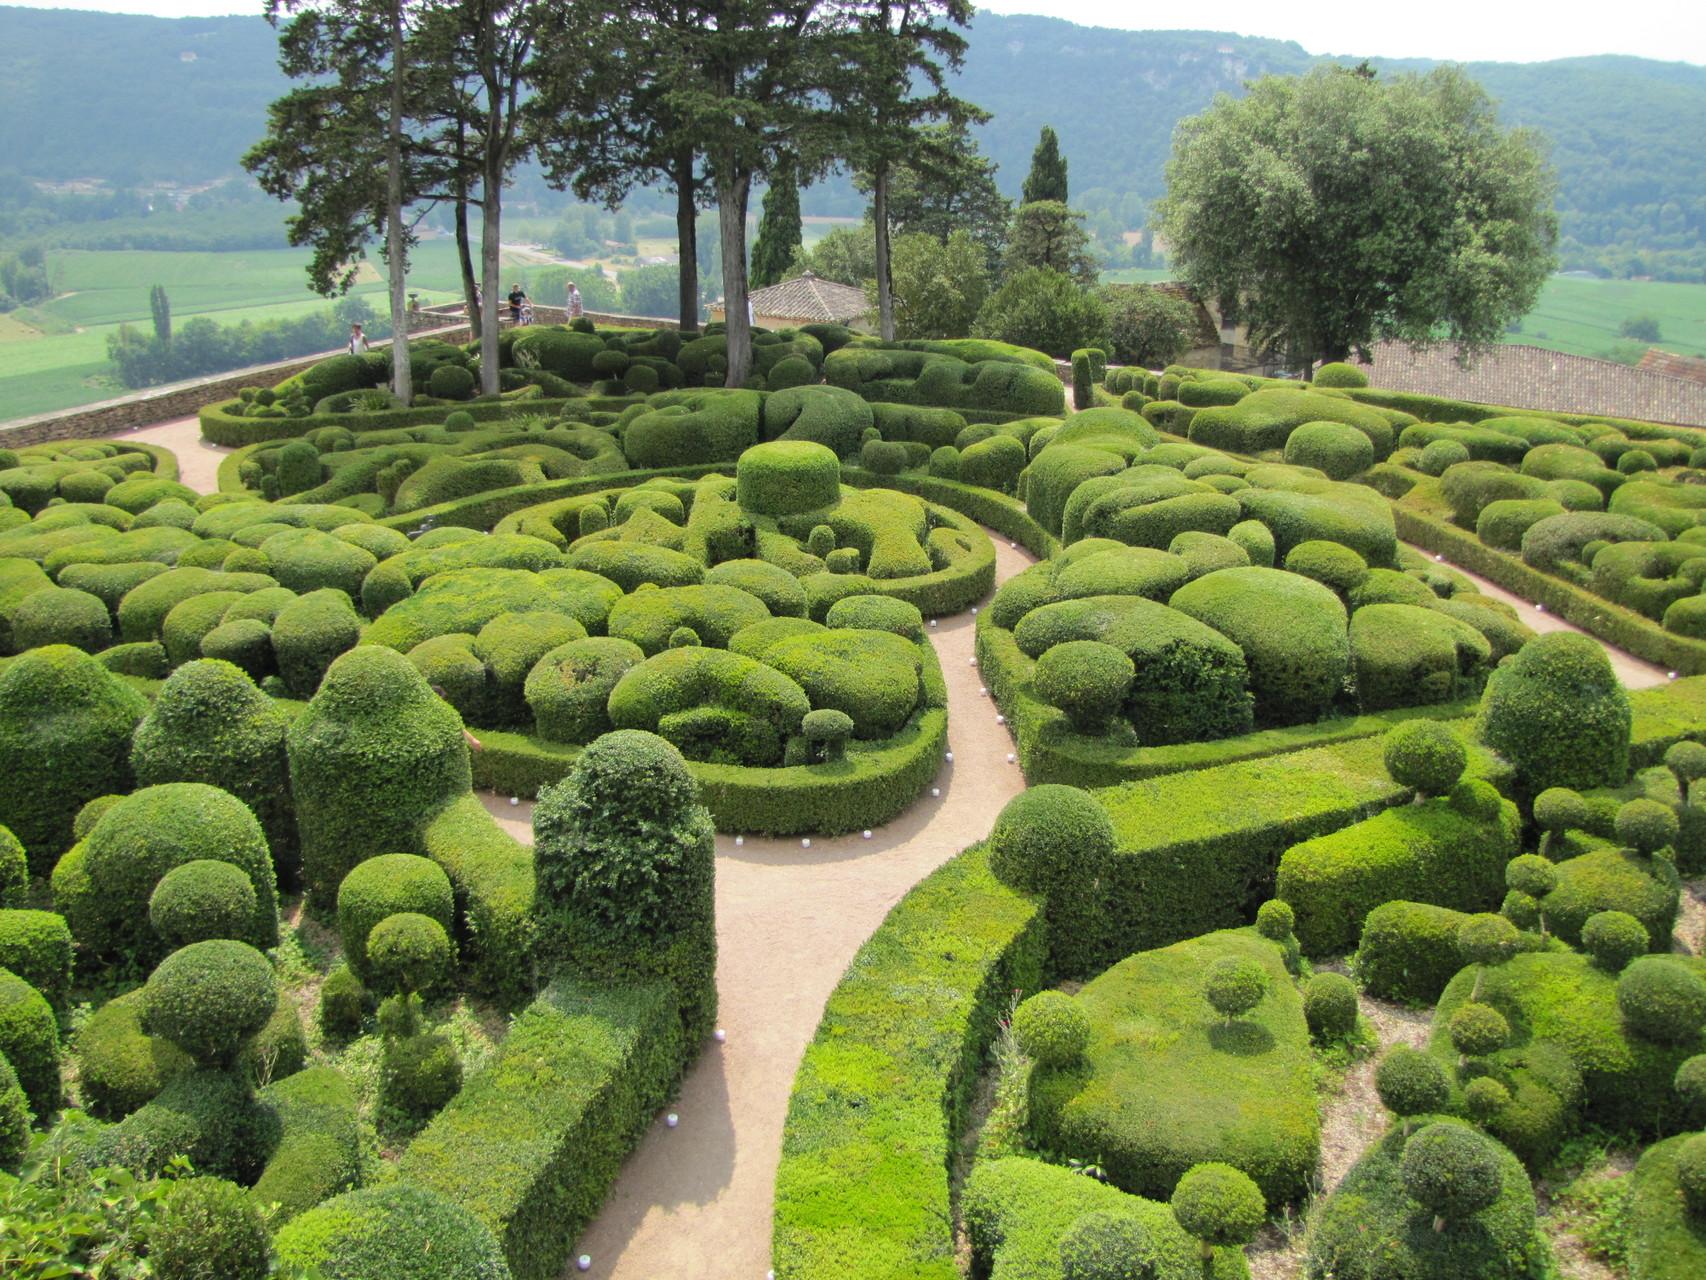 De tuinen van Marqueyssac in de Dordogne, Frankrijk.